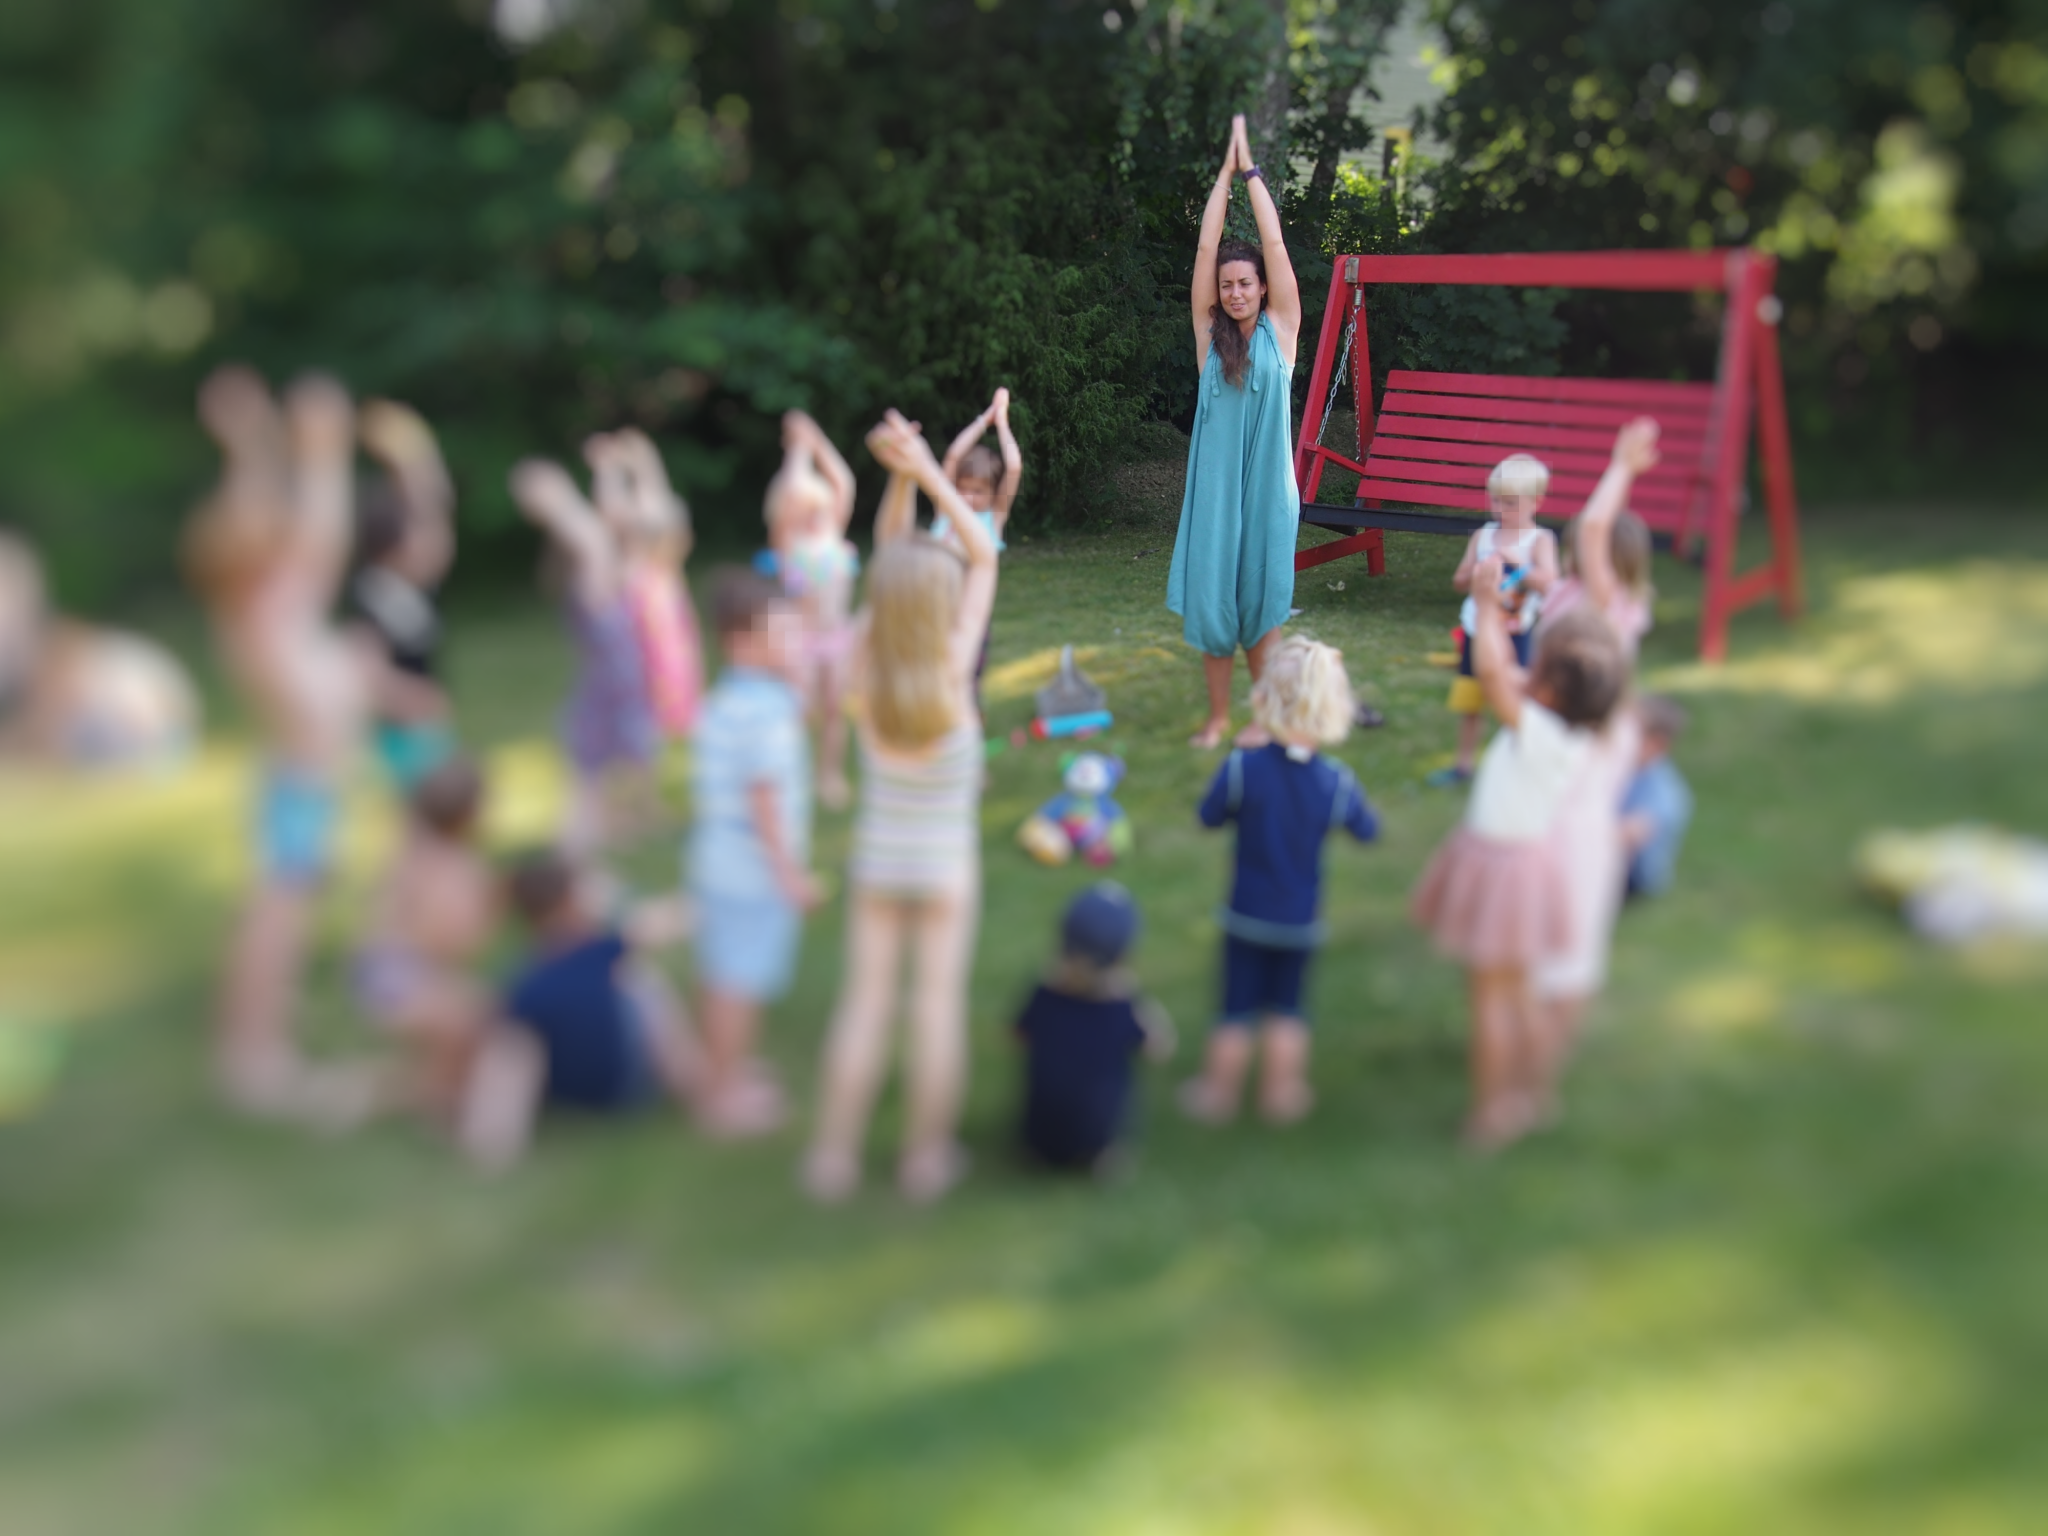 barnyoga, children yoga, kids yoga, barnyoga i stockholm, barnyoga i österåker, barnyoga i åkersberga, yoga for children